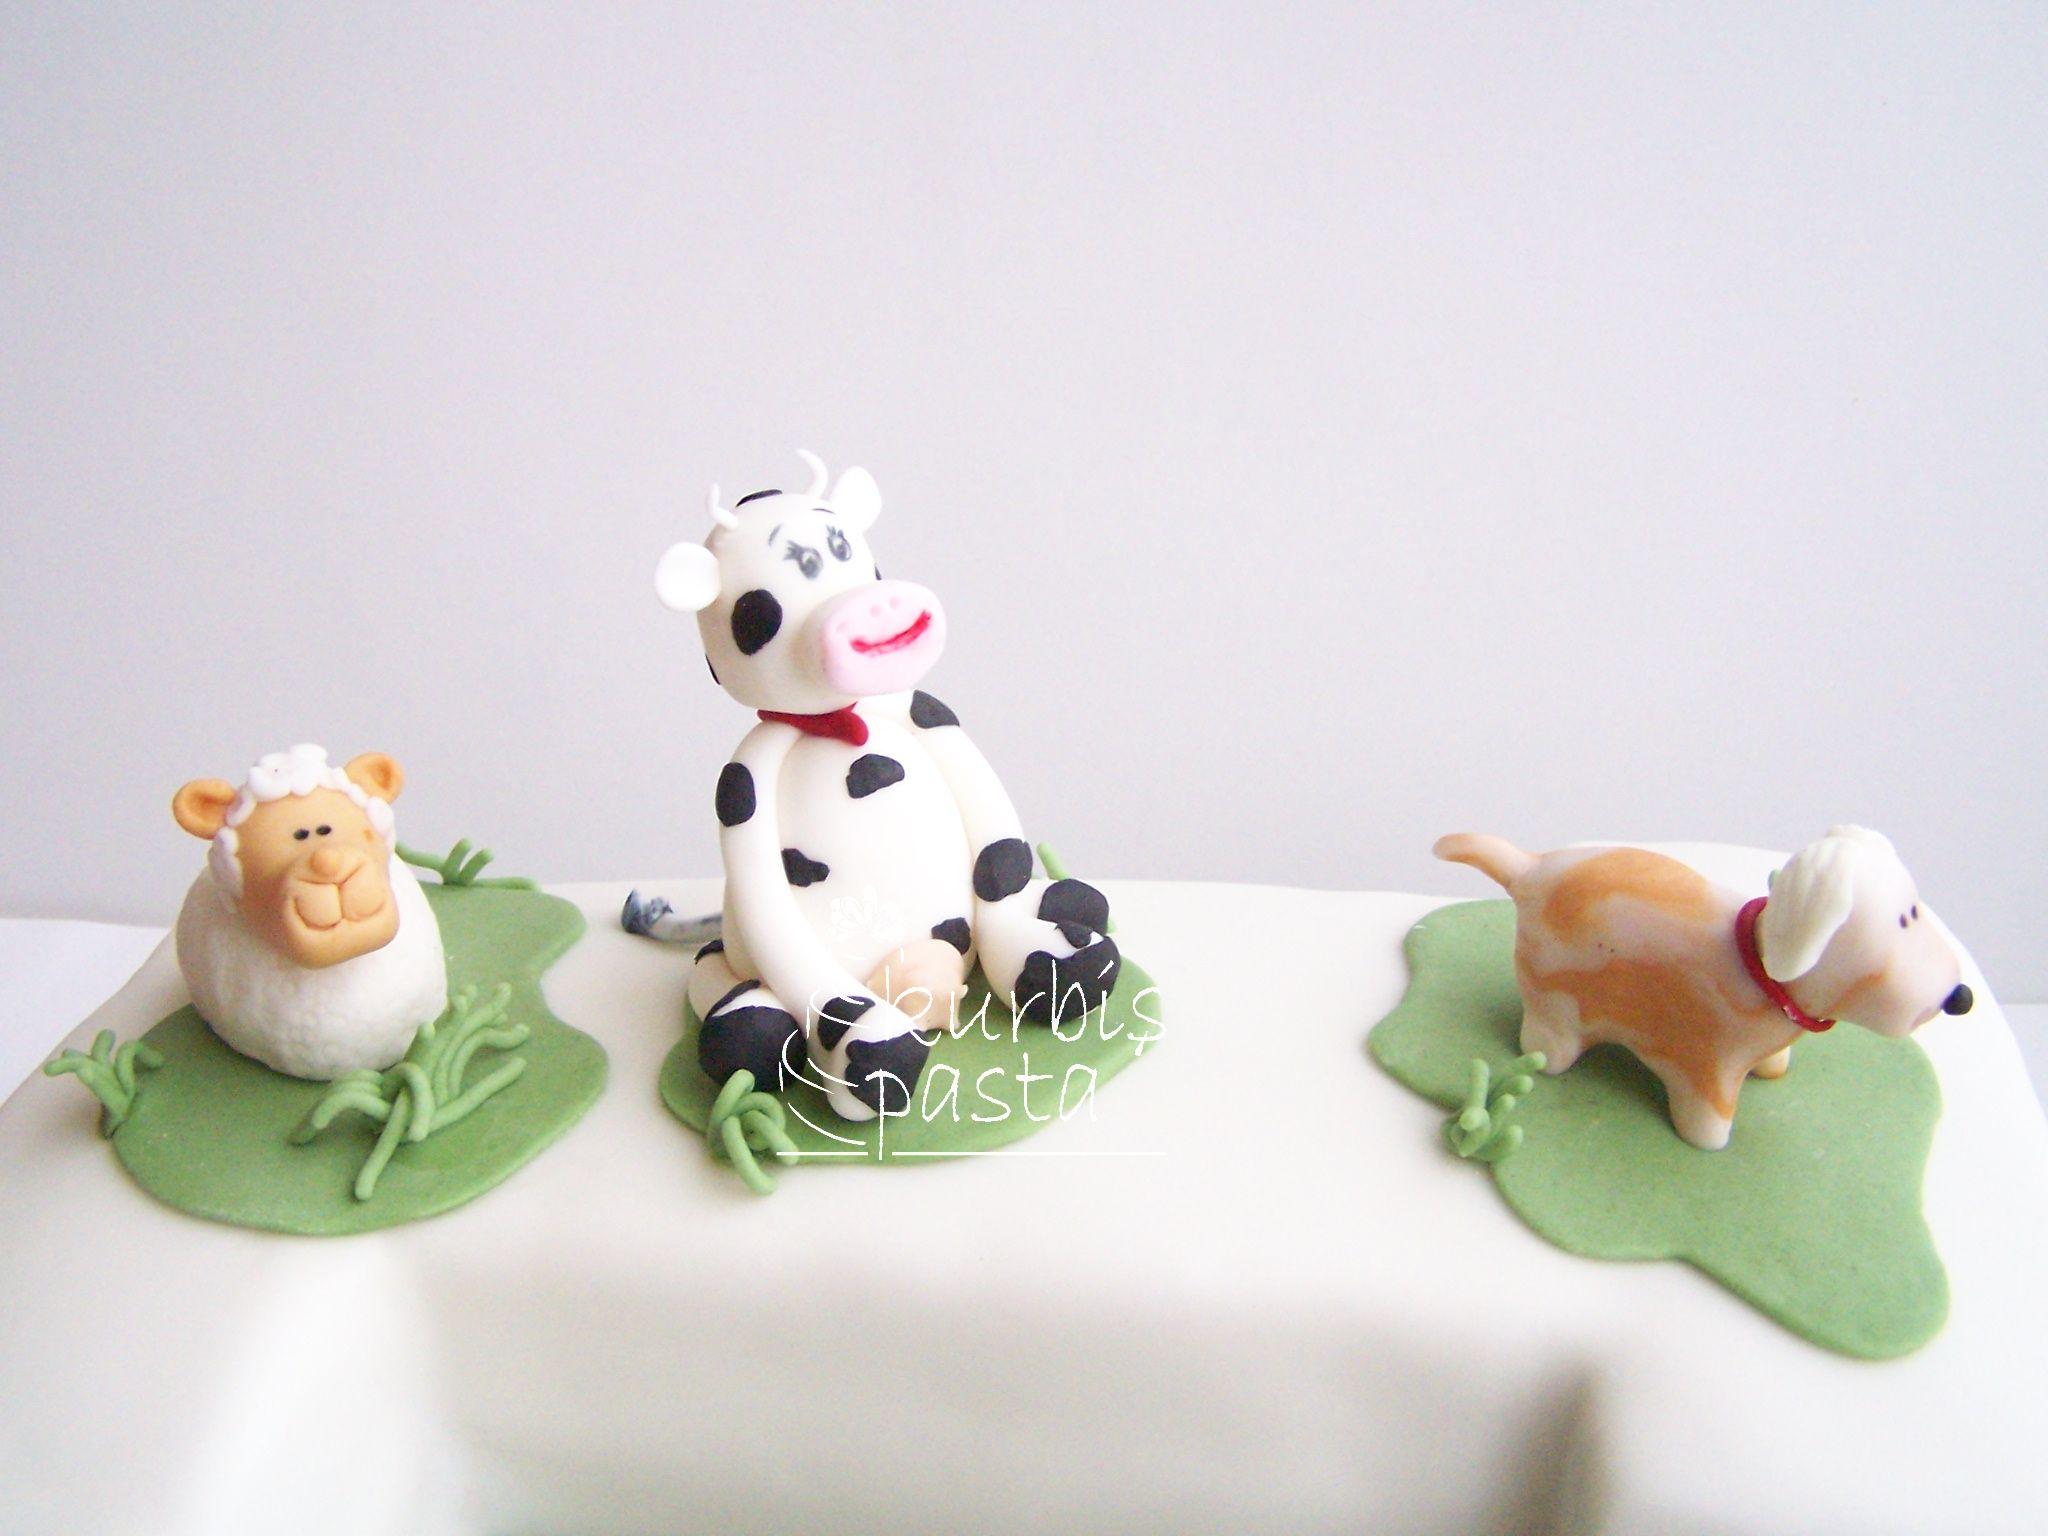 Cake Decorating Animal Figures Fondant Animal Figures For Cake Decoration My Cakes Pinterest